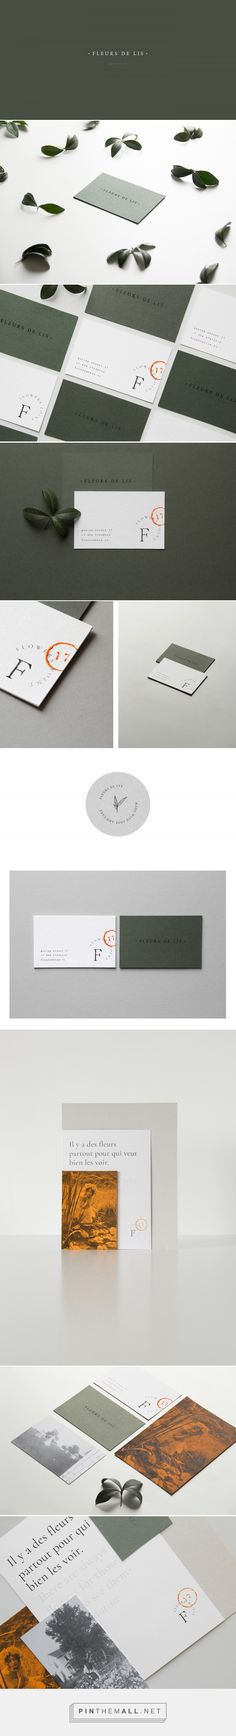 FLEUR DE LIS Flower Shop Branding by Anastasia Ko | Fivestar Branding Agency – Design and Branding Agency & Curated Inspiration Gallery